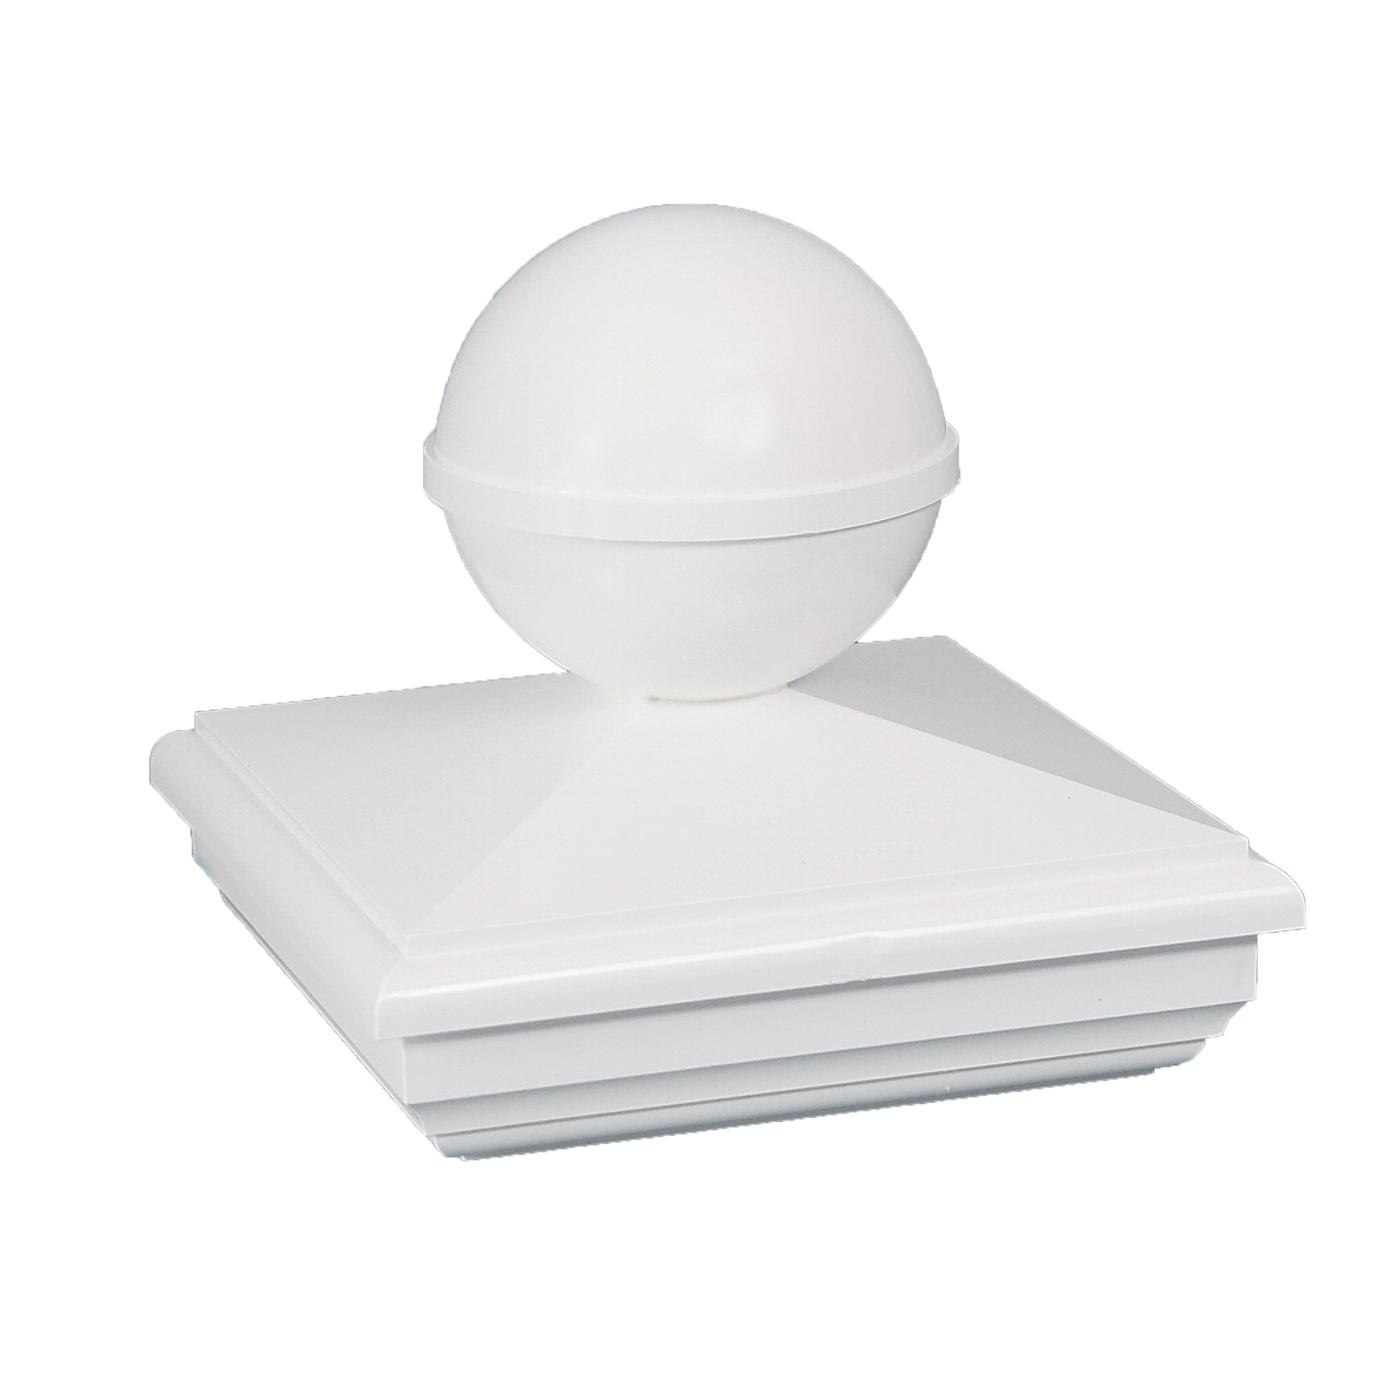 Classy Caps BN255 NEW ENGLAND BALL PVC POST CAP 5X5 - White